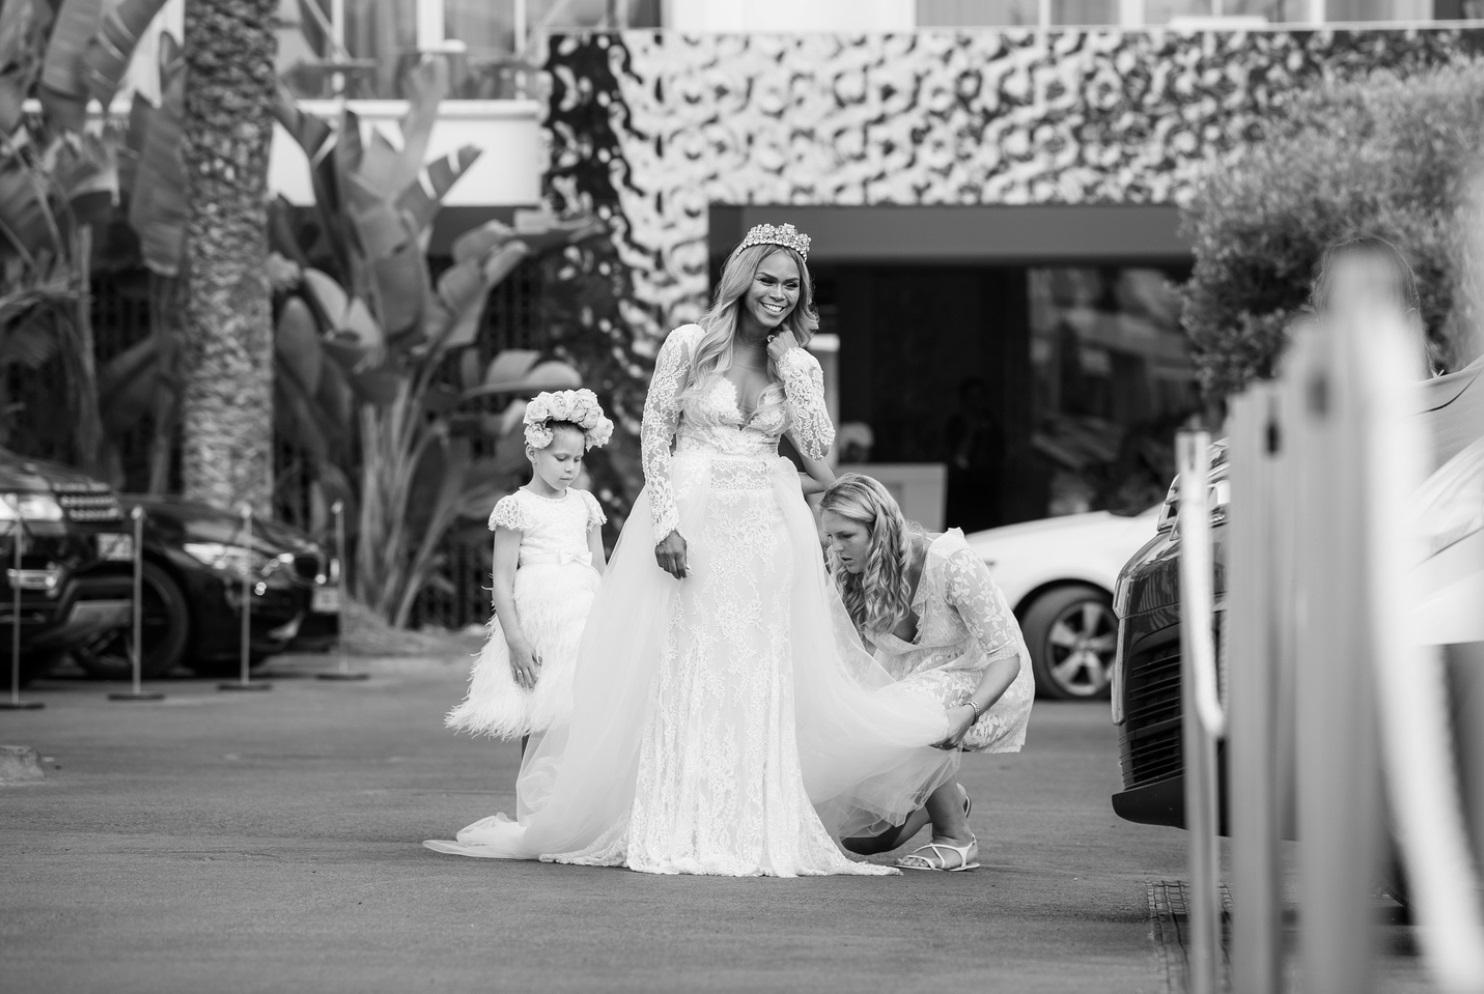 ibiza wedding flowers bouquet black and white